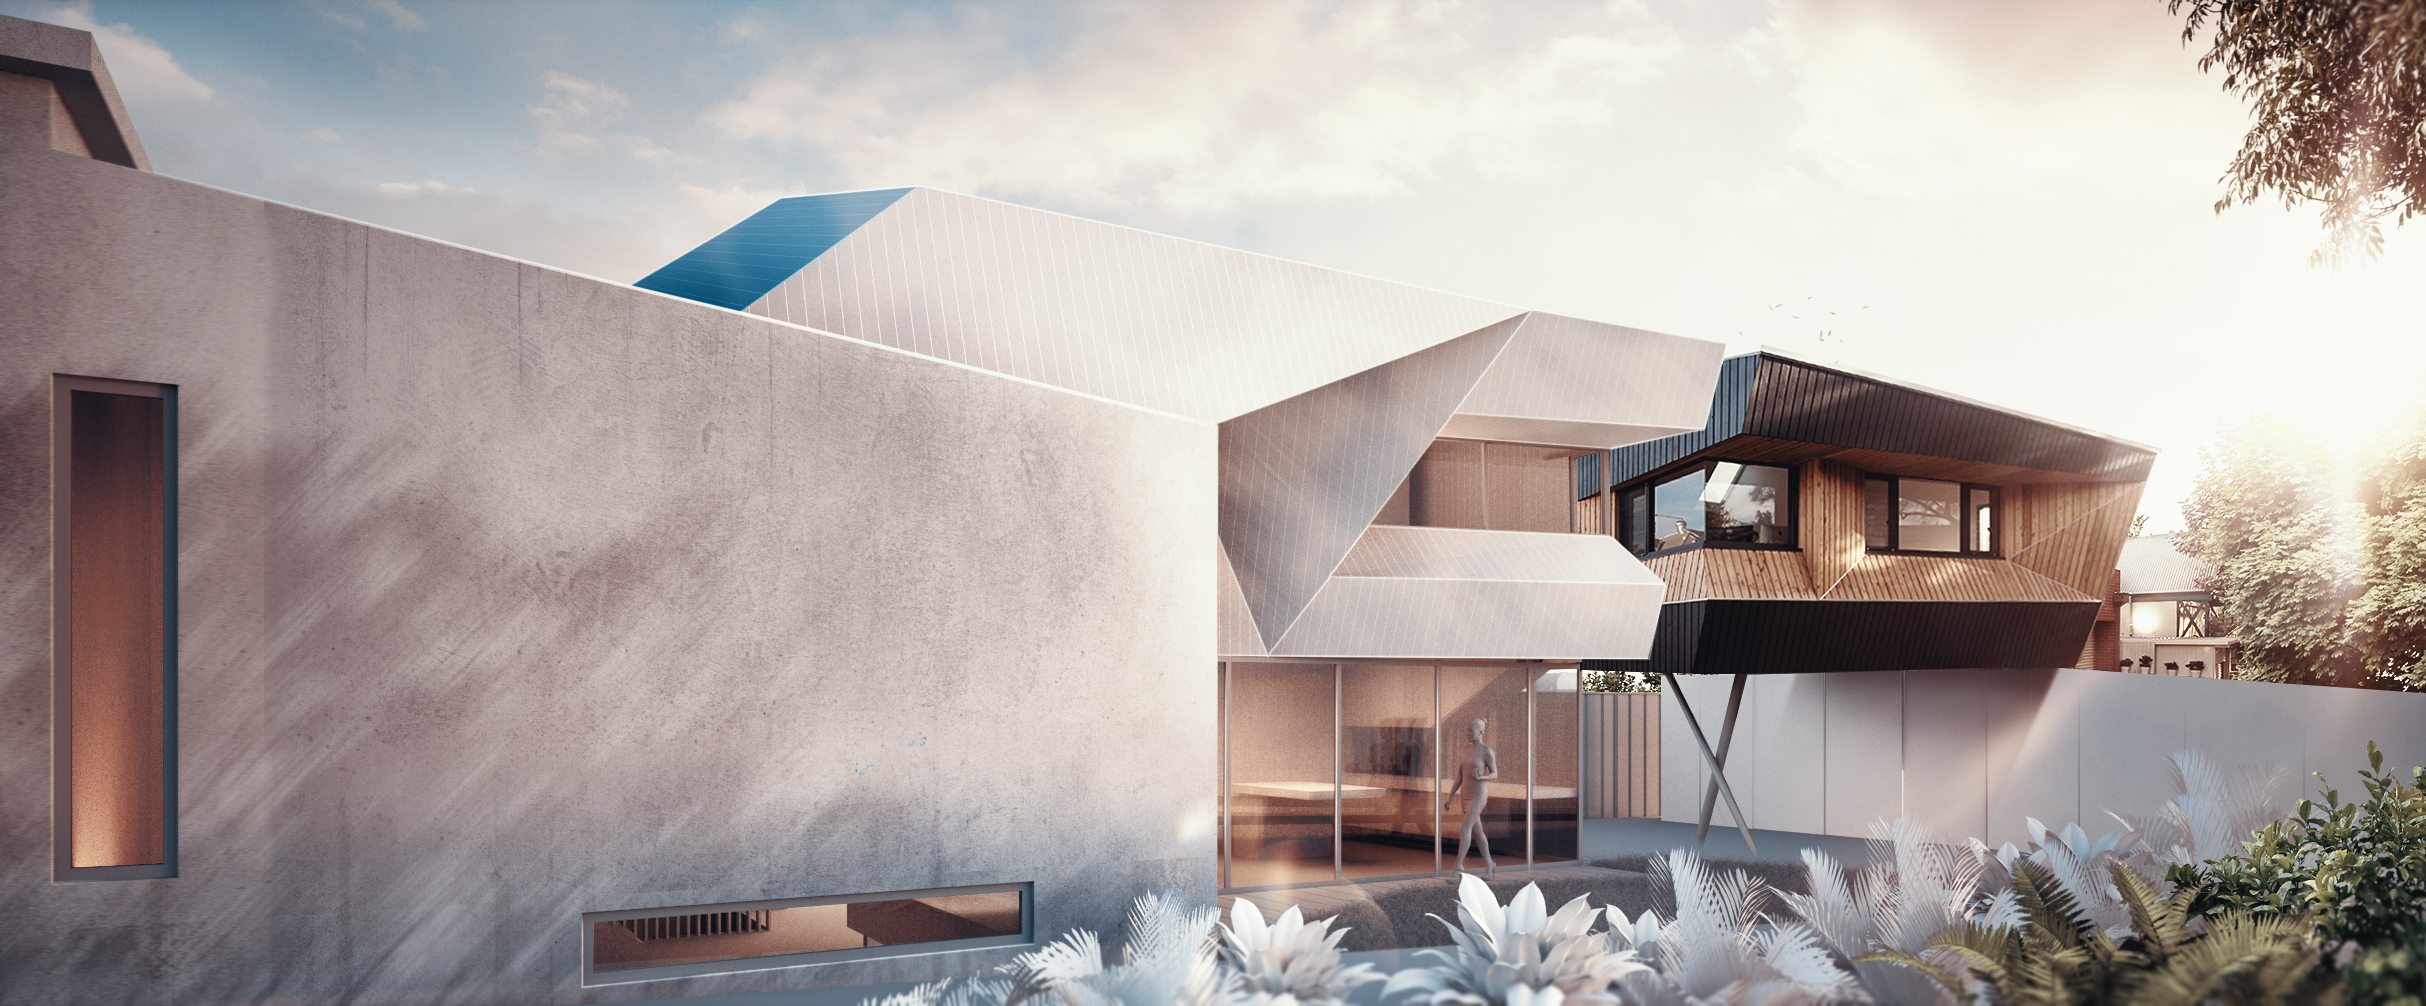 Braham Architects Thompson Render.jpg